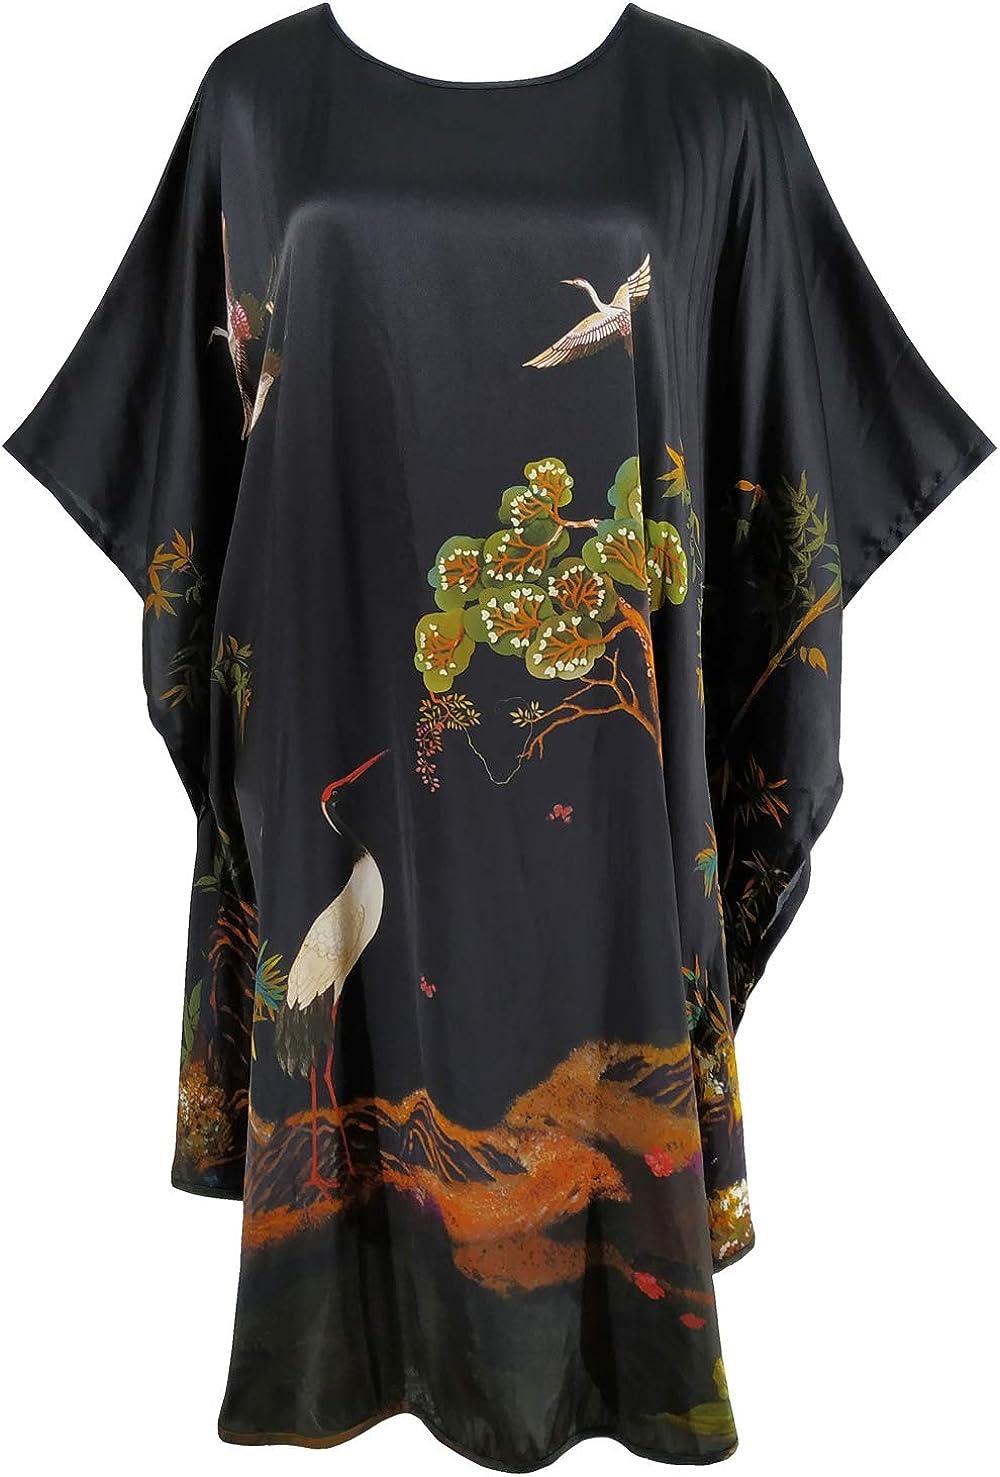 Womens 19mm 100/% Silk Nightdress Bath Robe Sleepwear Nighties Shirts Size S-7XL